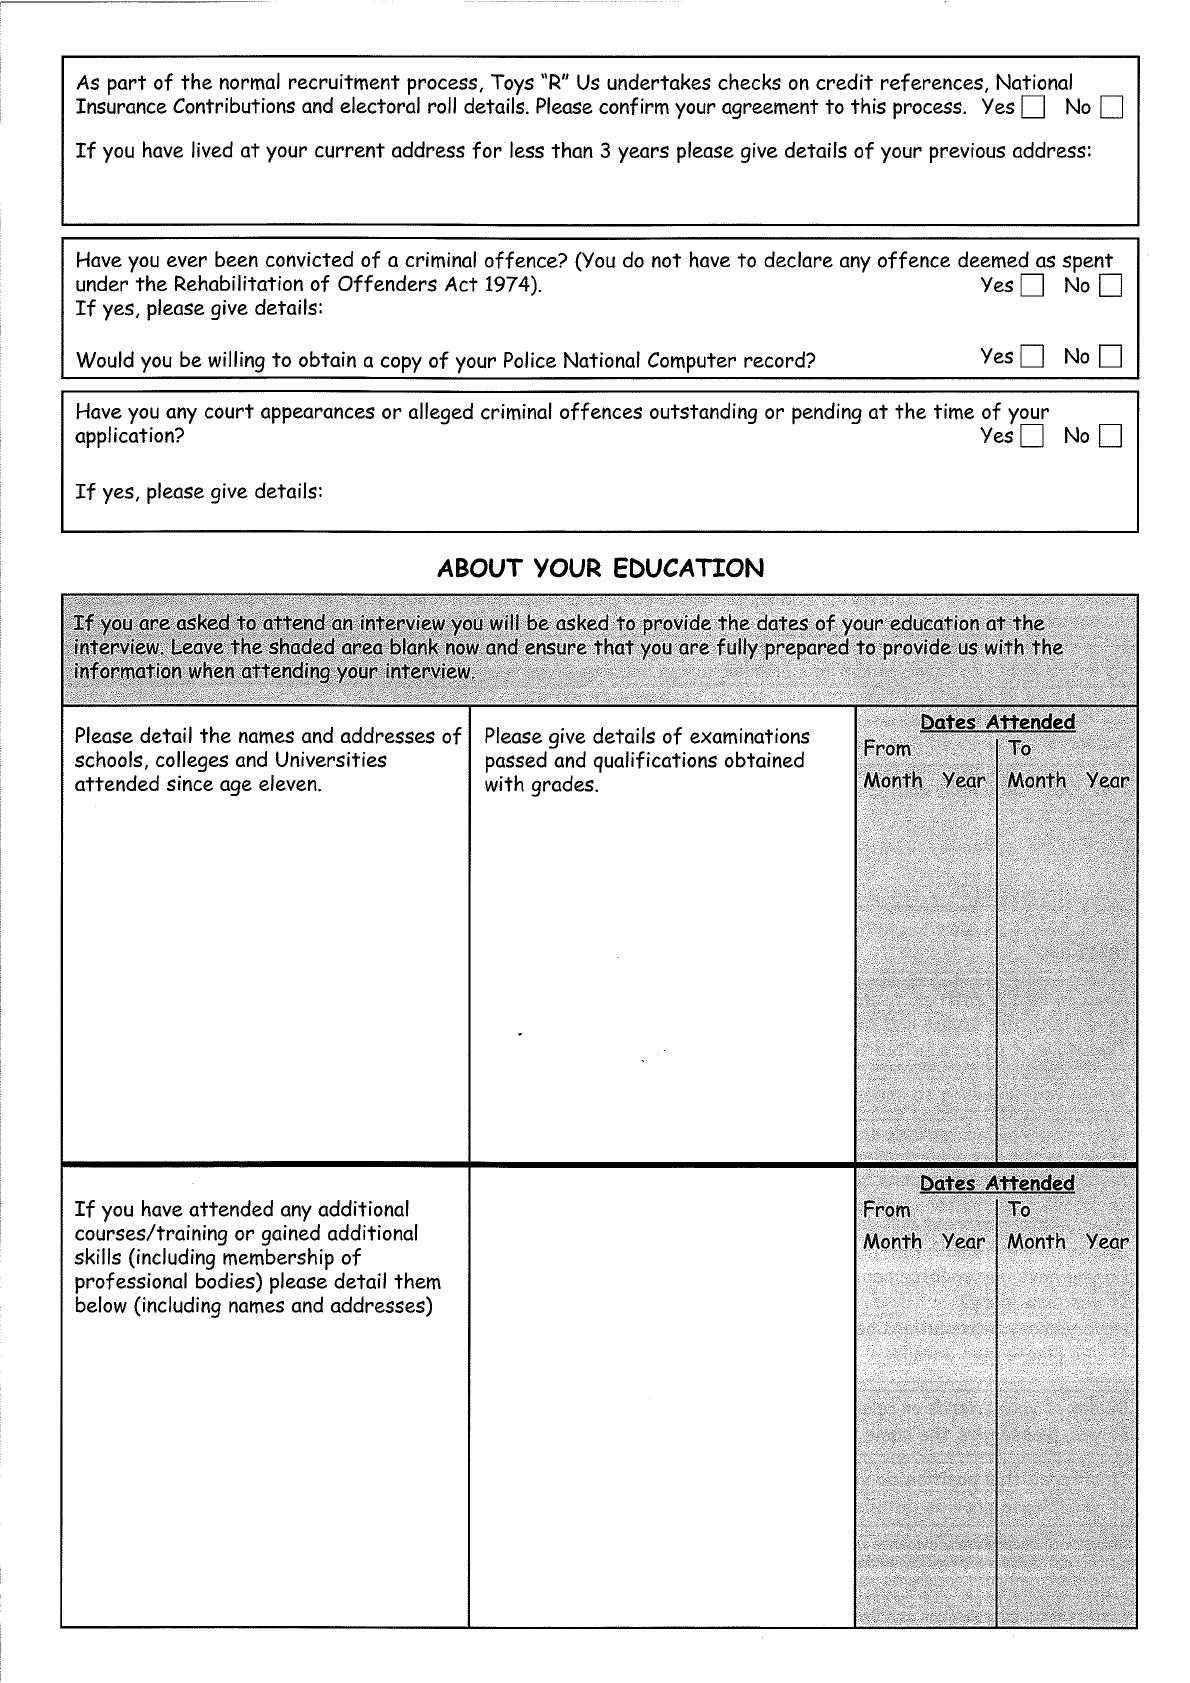 Free Printable Toys R Us Job Application Form Page 2